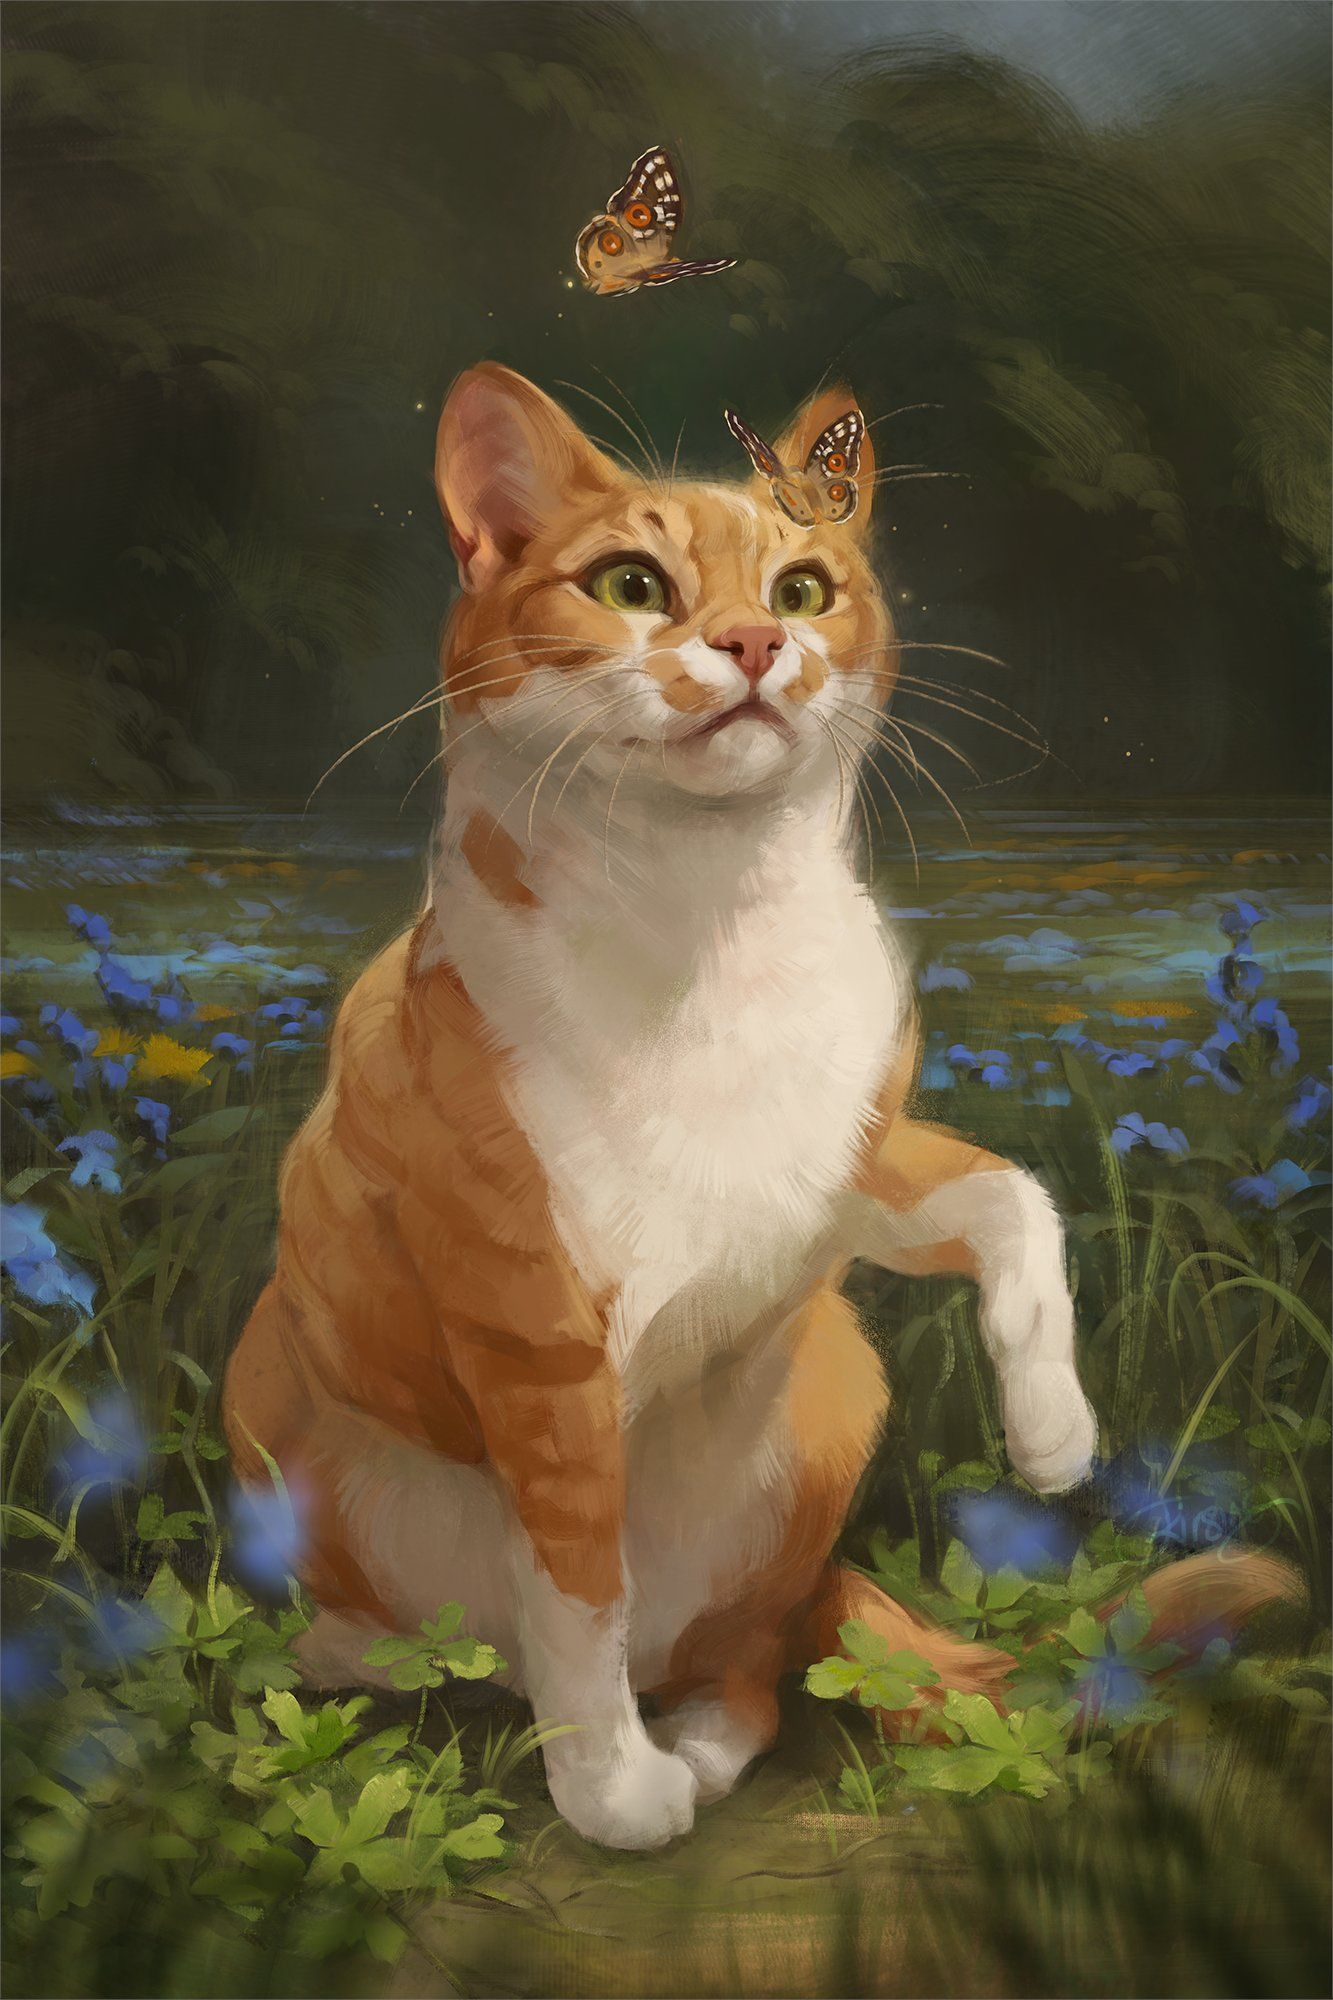 Pin by Shannon O'Brien on Artists in 2020 Cat art, Cute